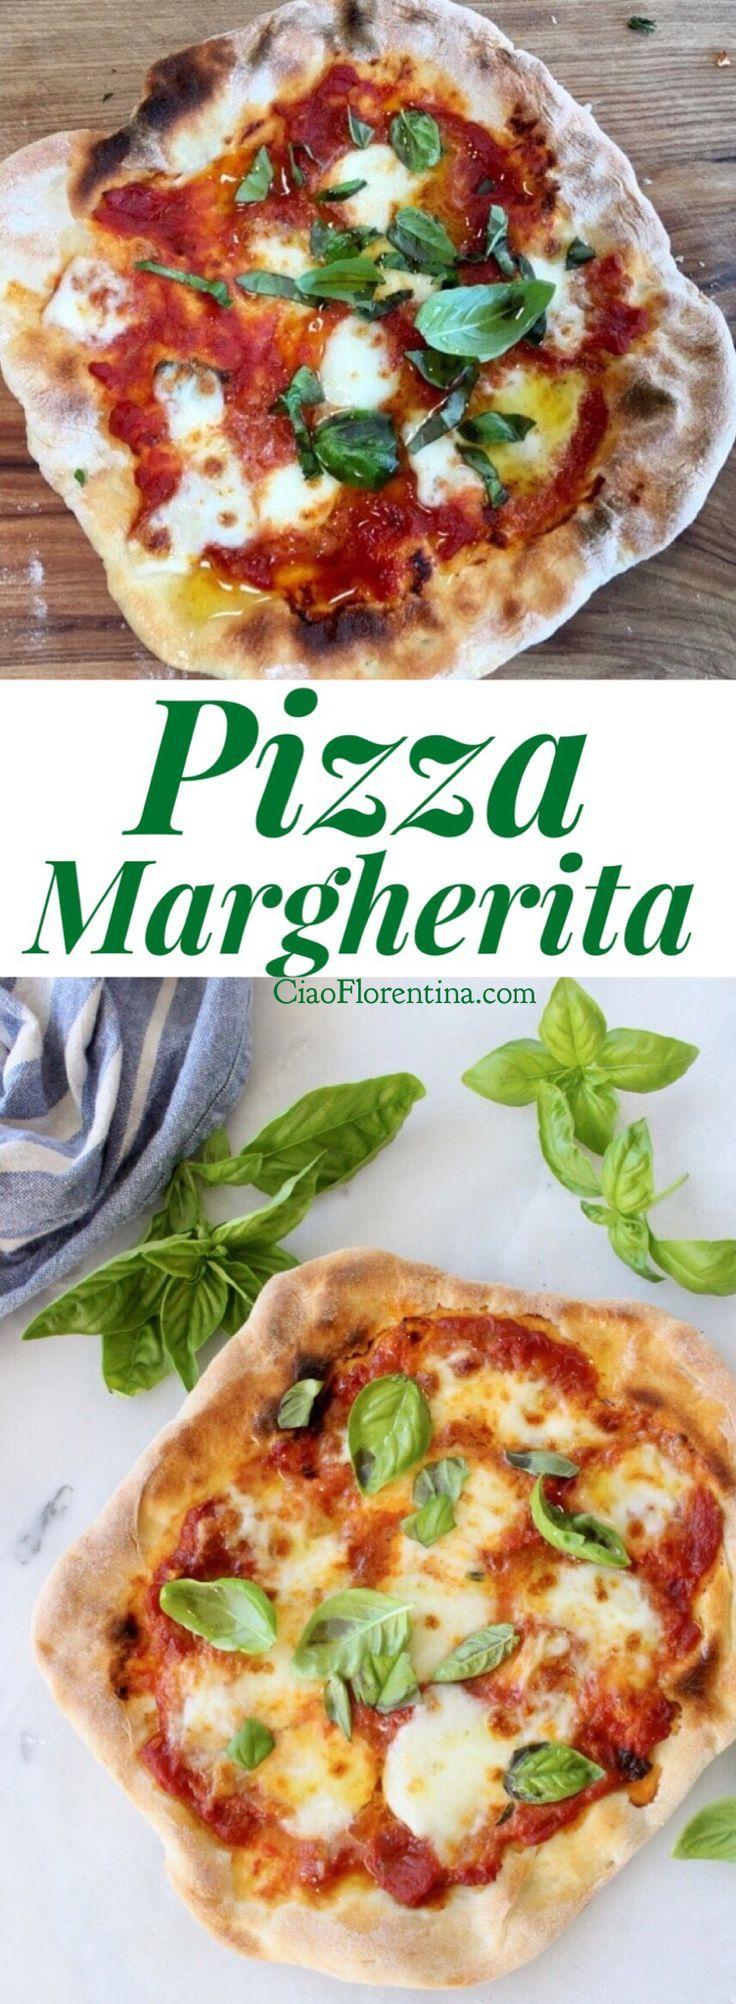 Easy Pizza Margherita Recipe VIDEO, with Mozzarella si Bufala, Basil and San Marzano Tomatoes! Thin Crust Authentic Recipe | CiaoFlorentina.com @CiaoFlorentina